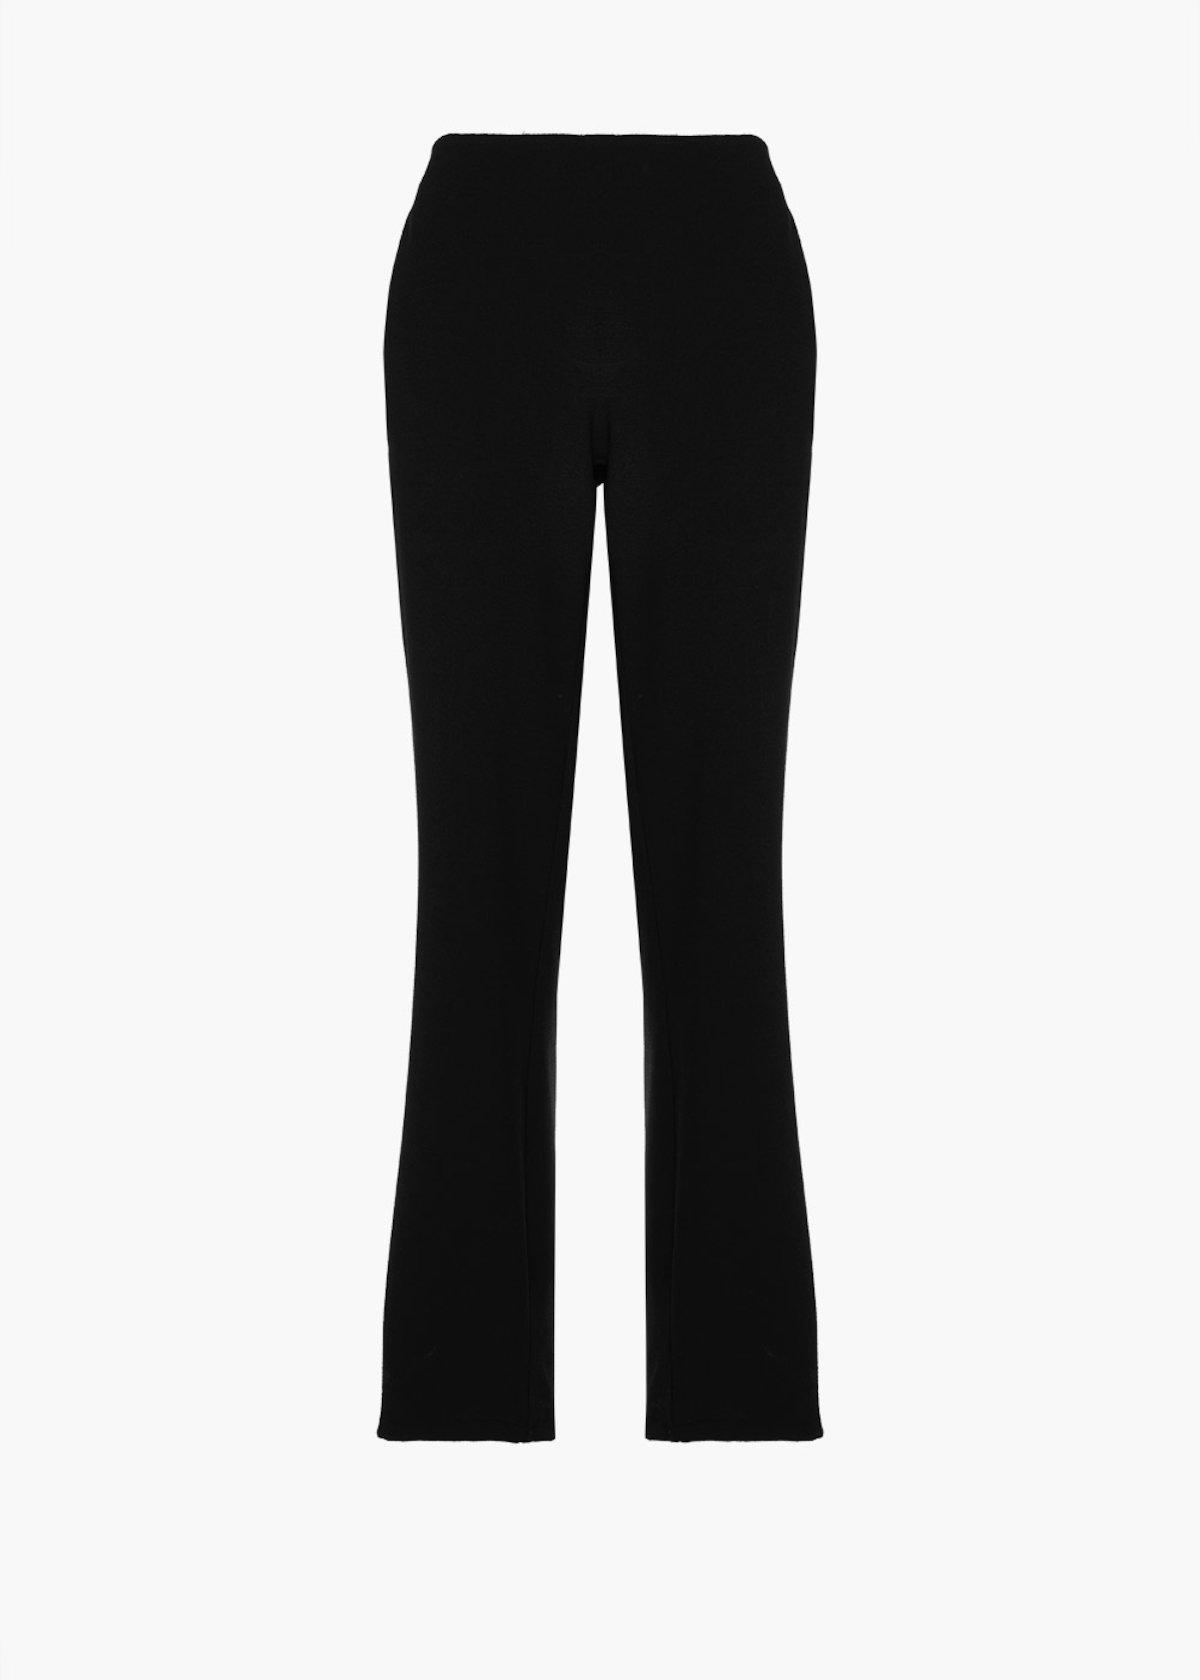 Pantaloni Pedros dal fit ampio - Black - Donna - Immagine categoria